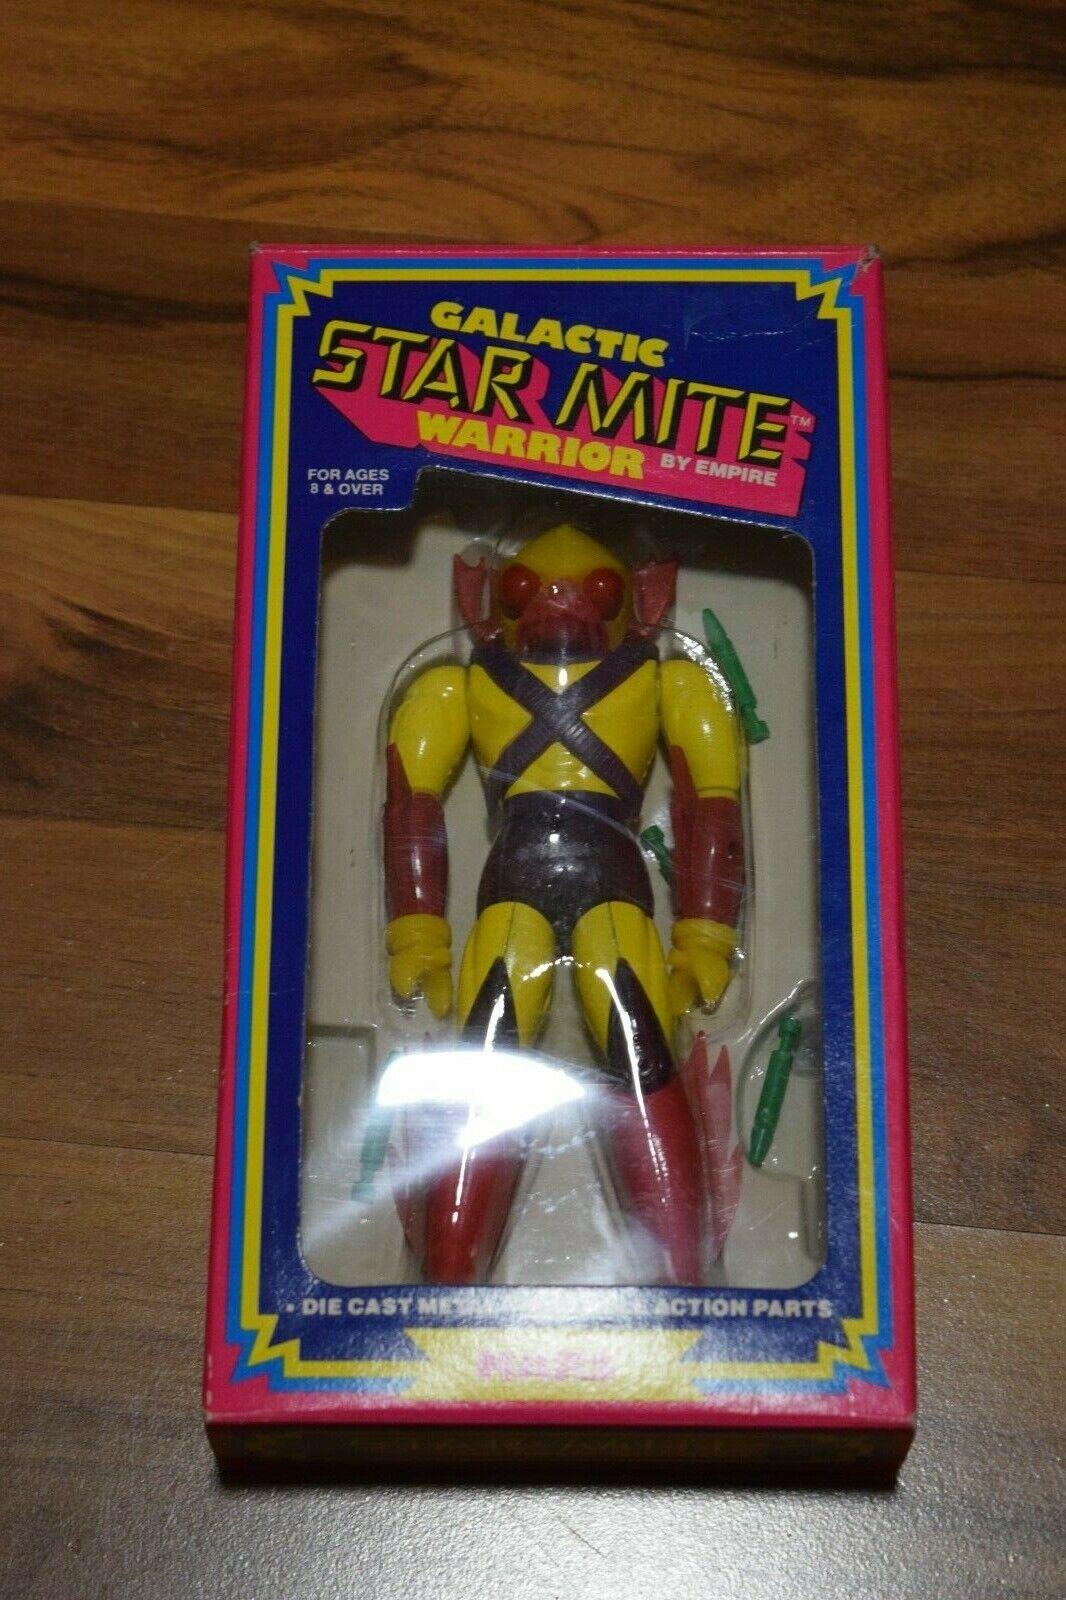 Galactic Star Mite Warrior Mars Mattel